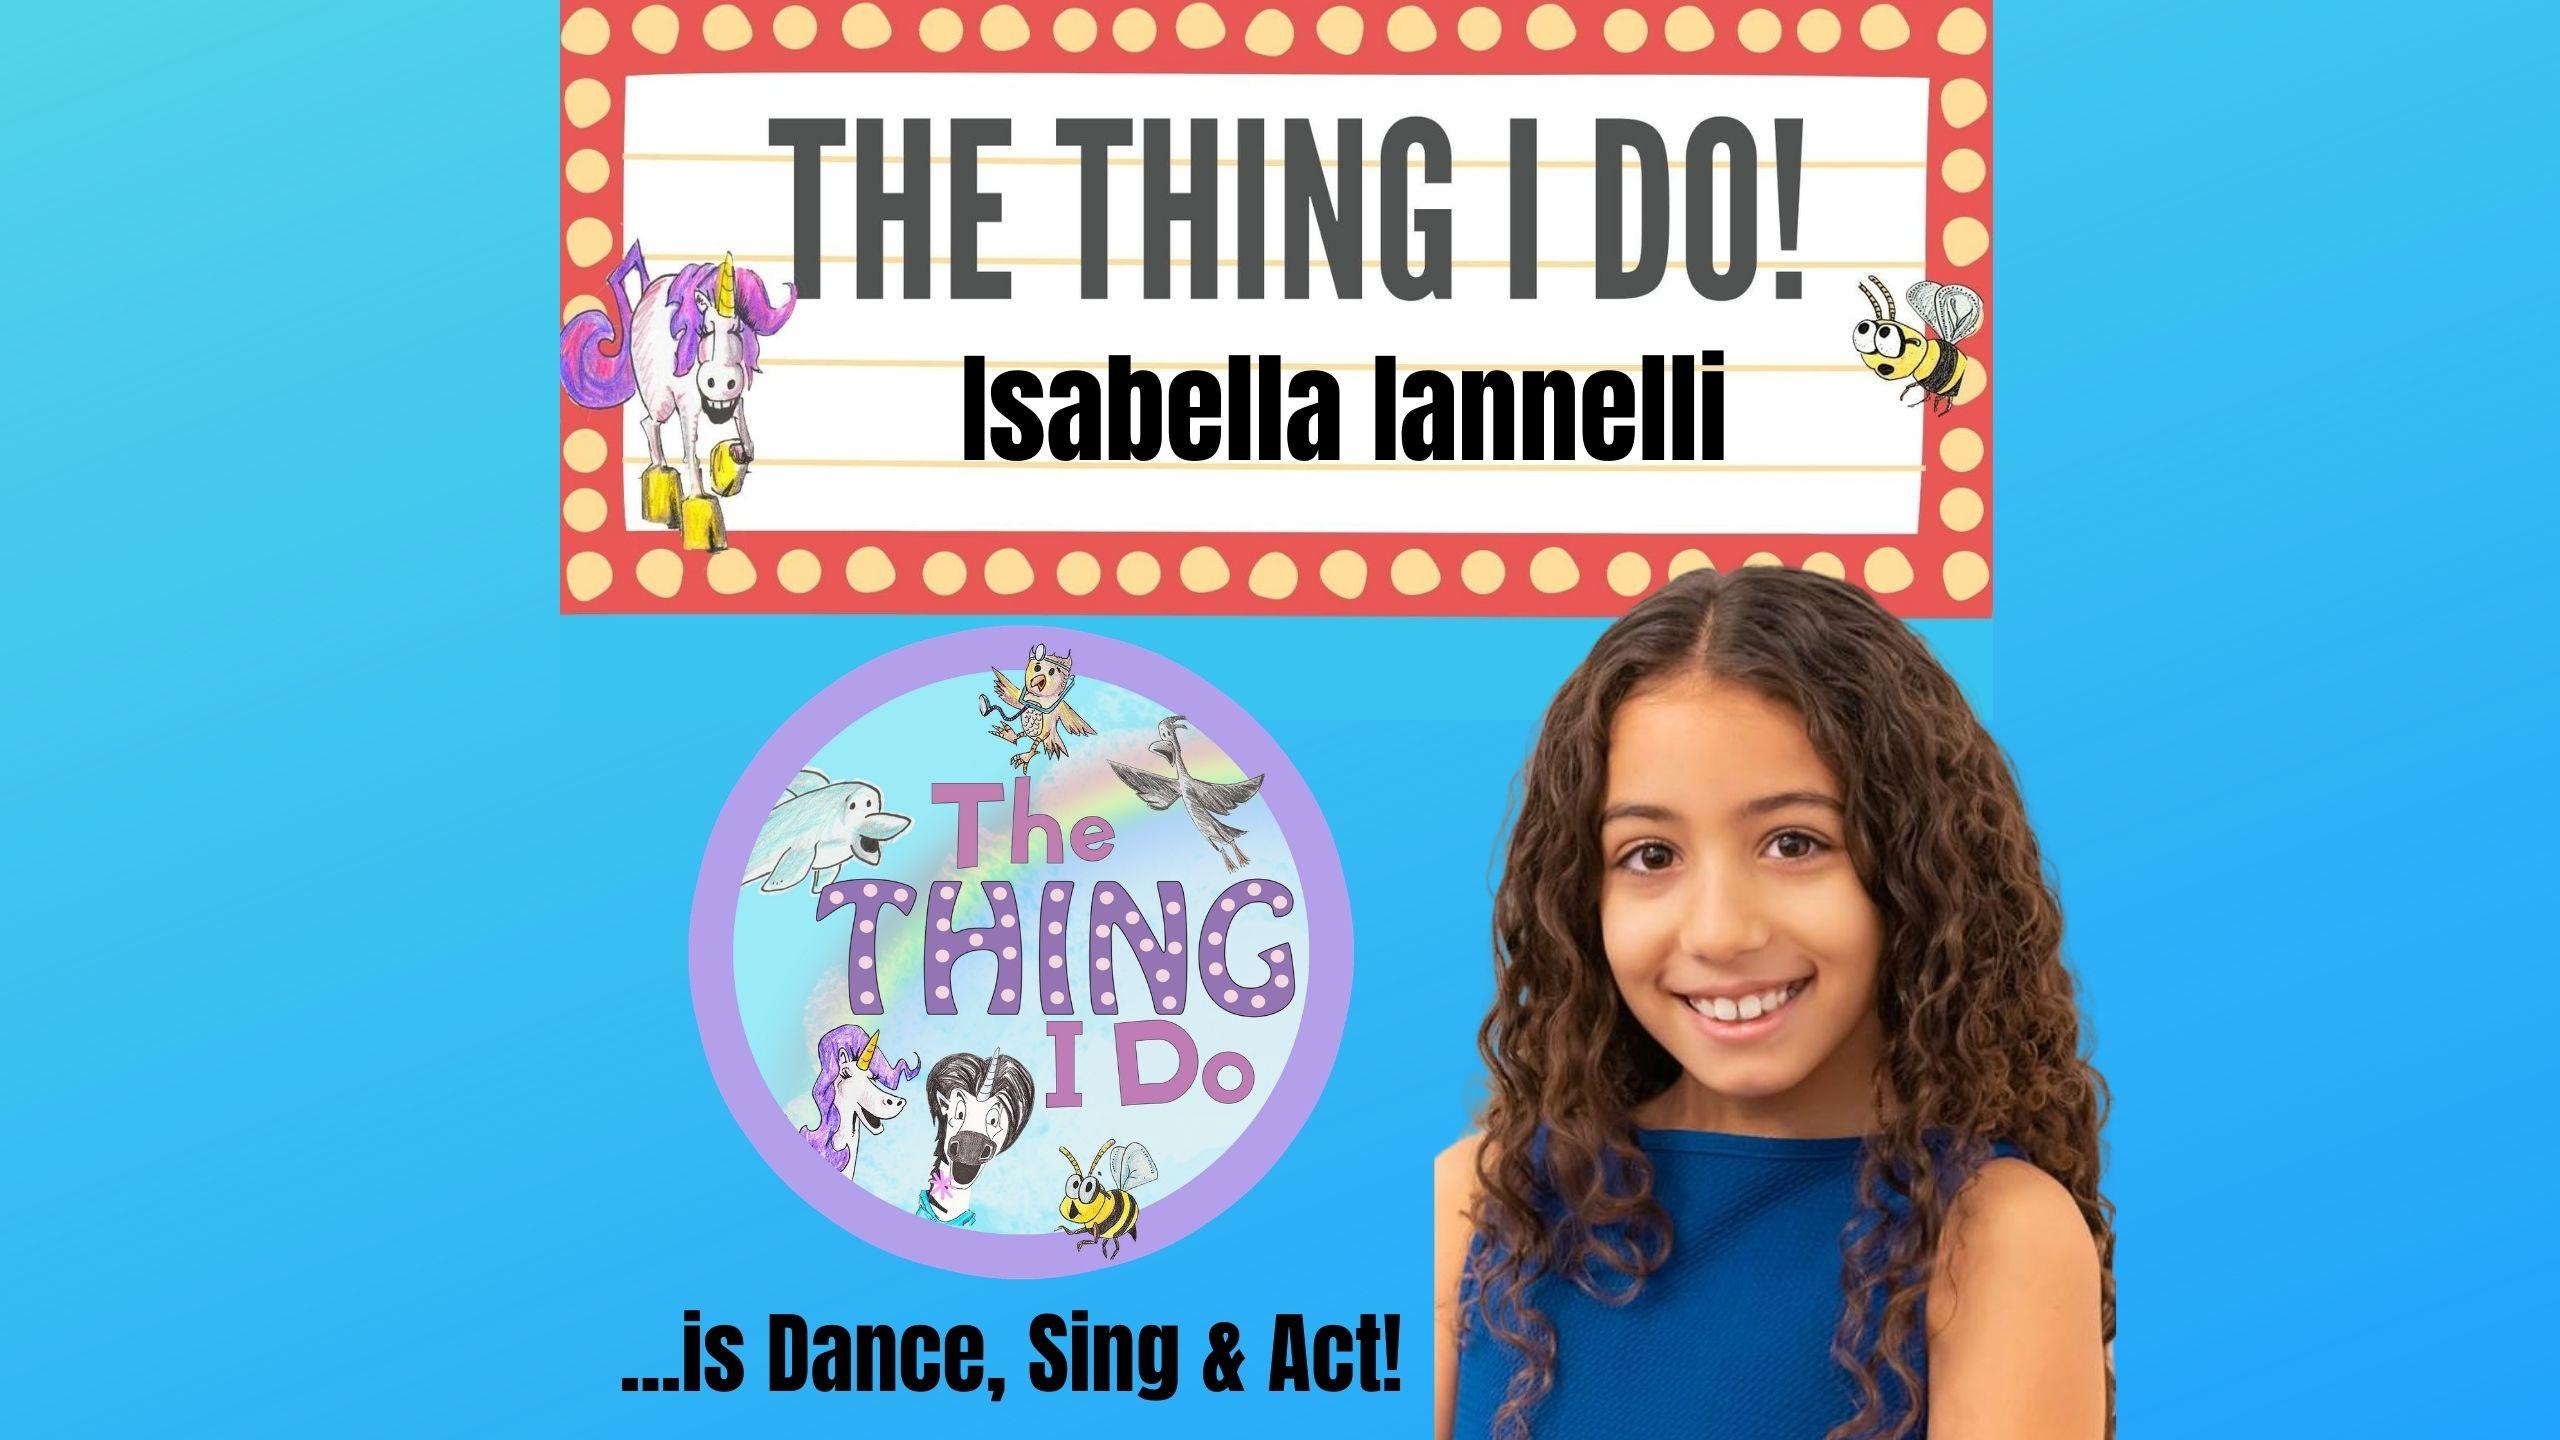 Isabella Iannelli dancer and singer kids